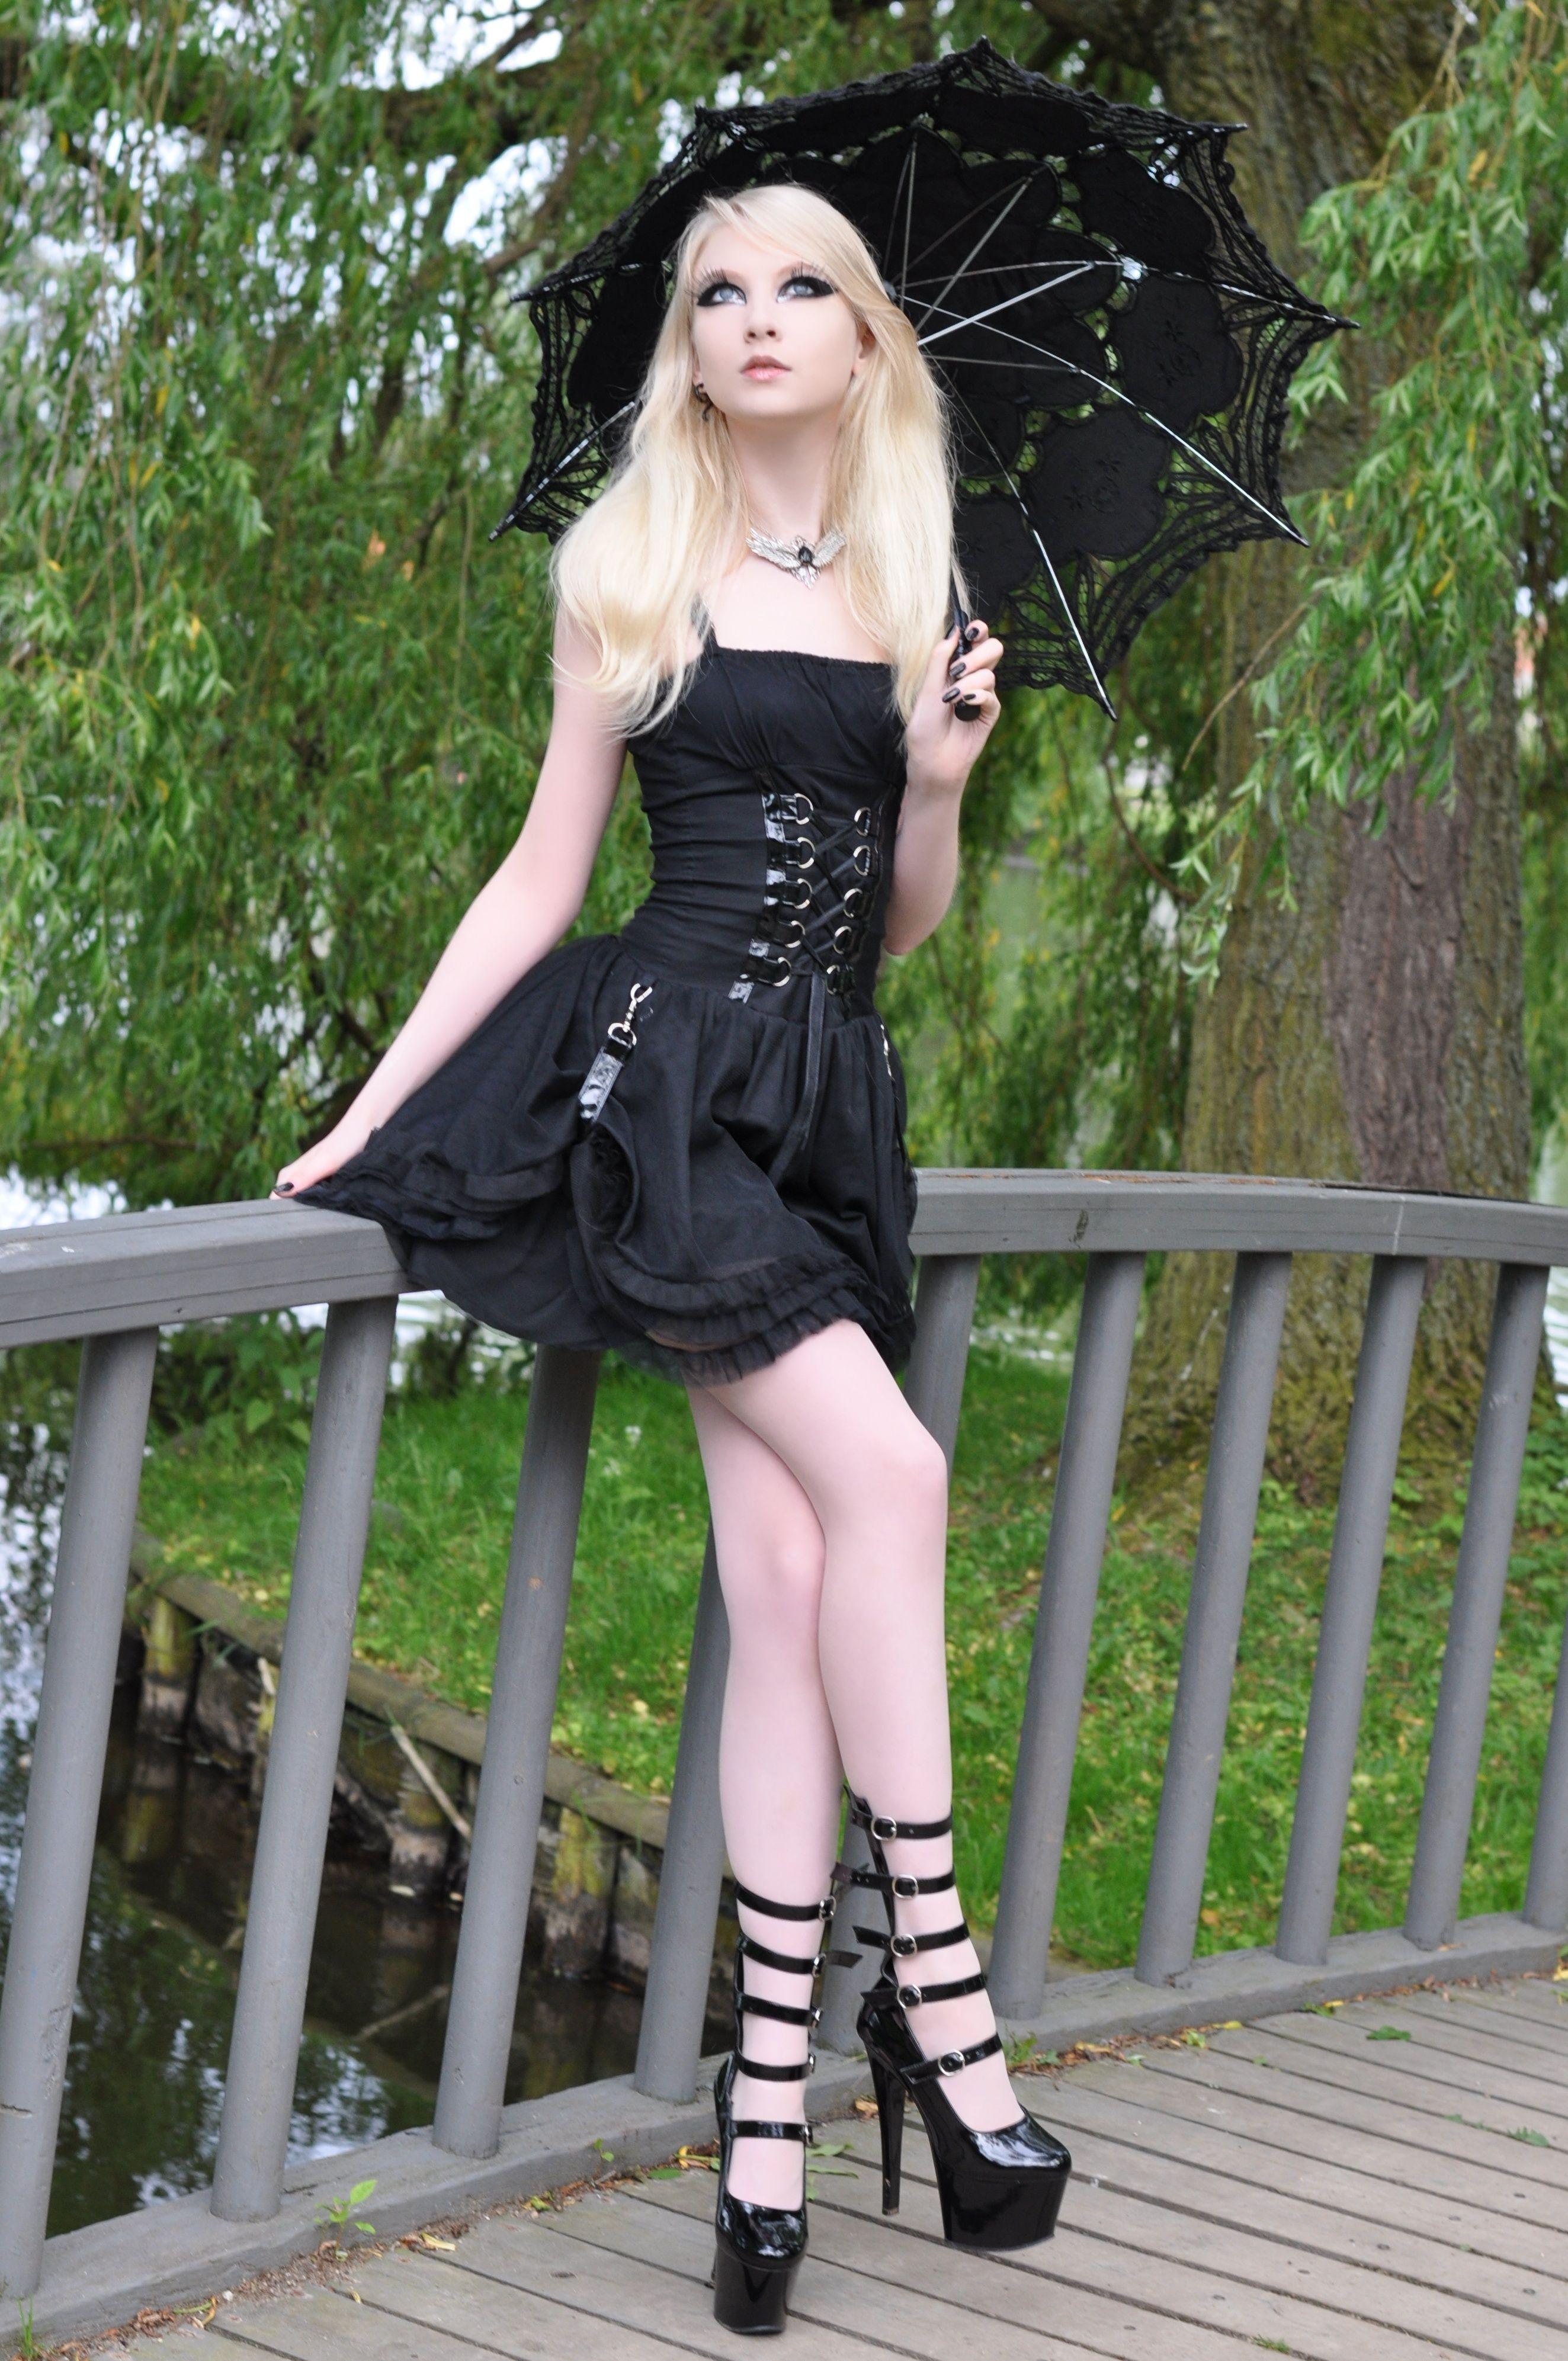 gothic-picture-teen-netherland-porno-teen